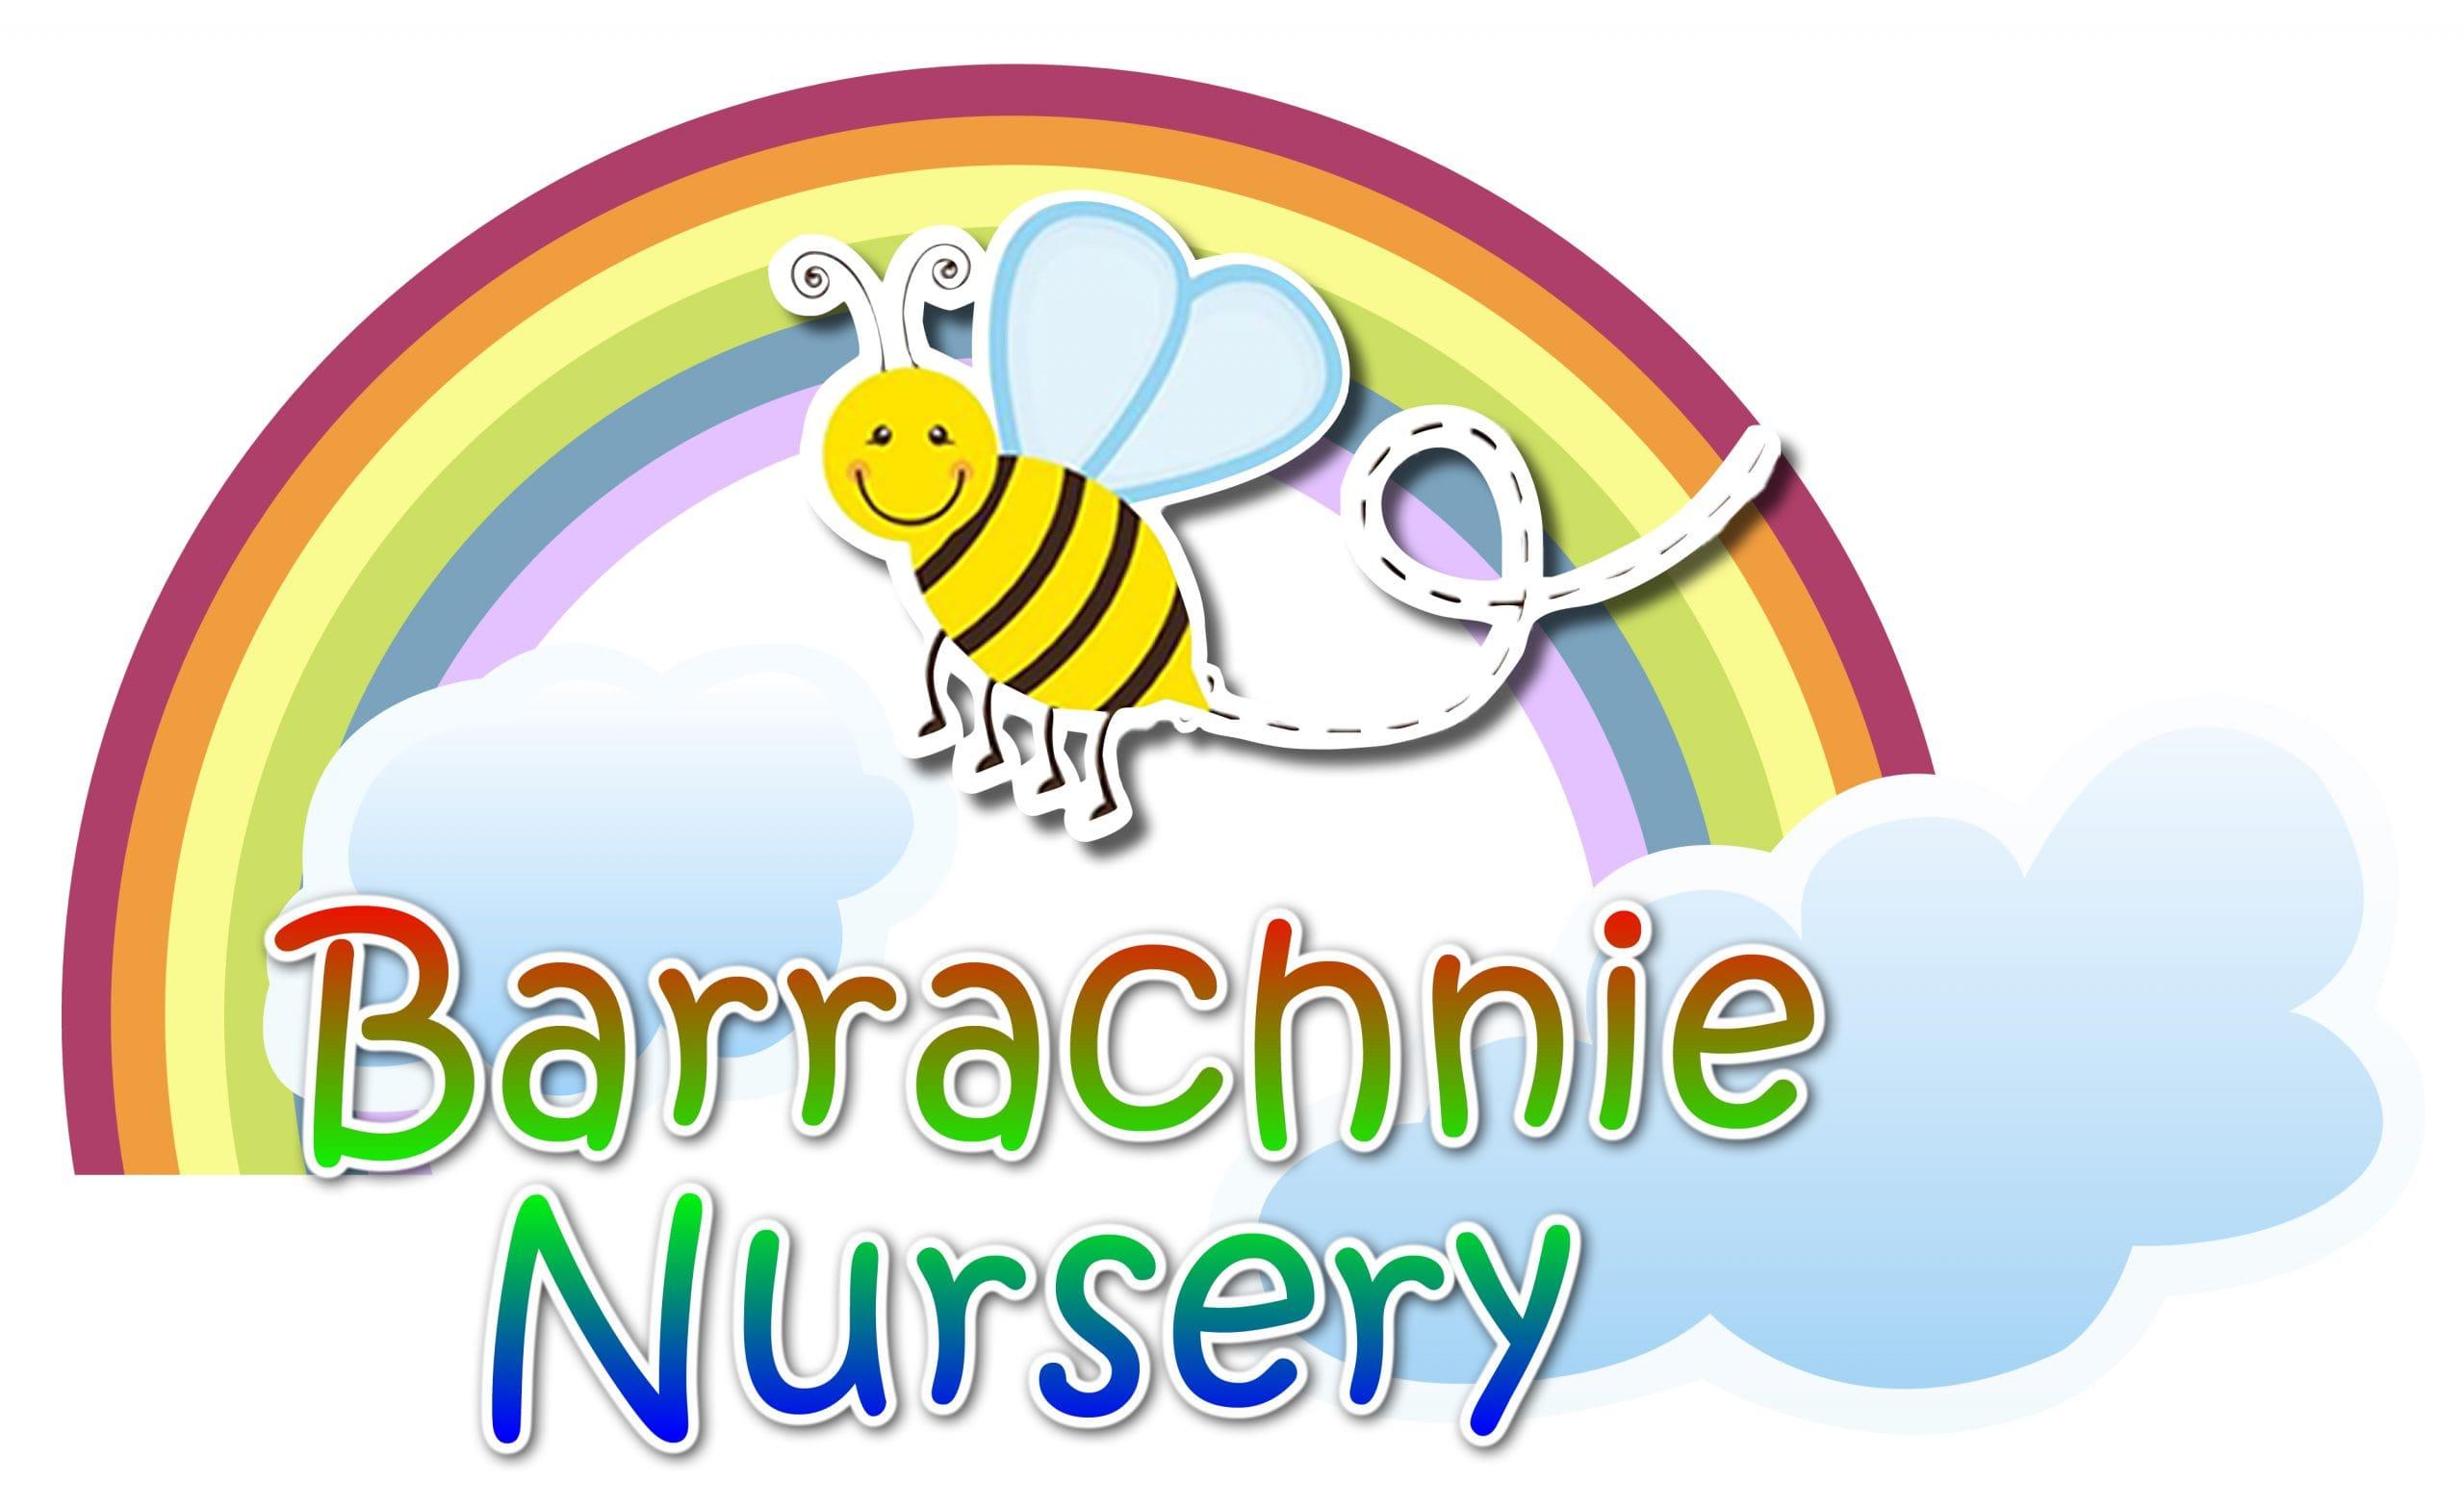 Barrachnie Nursery Logo